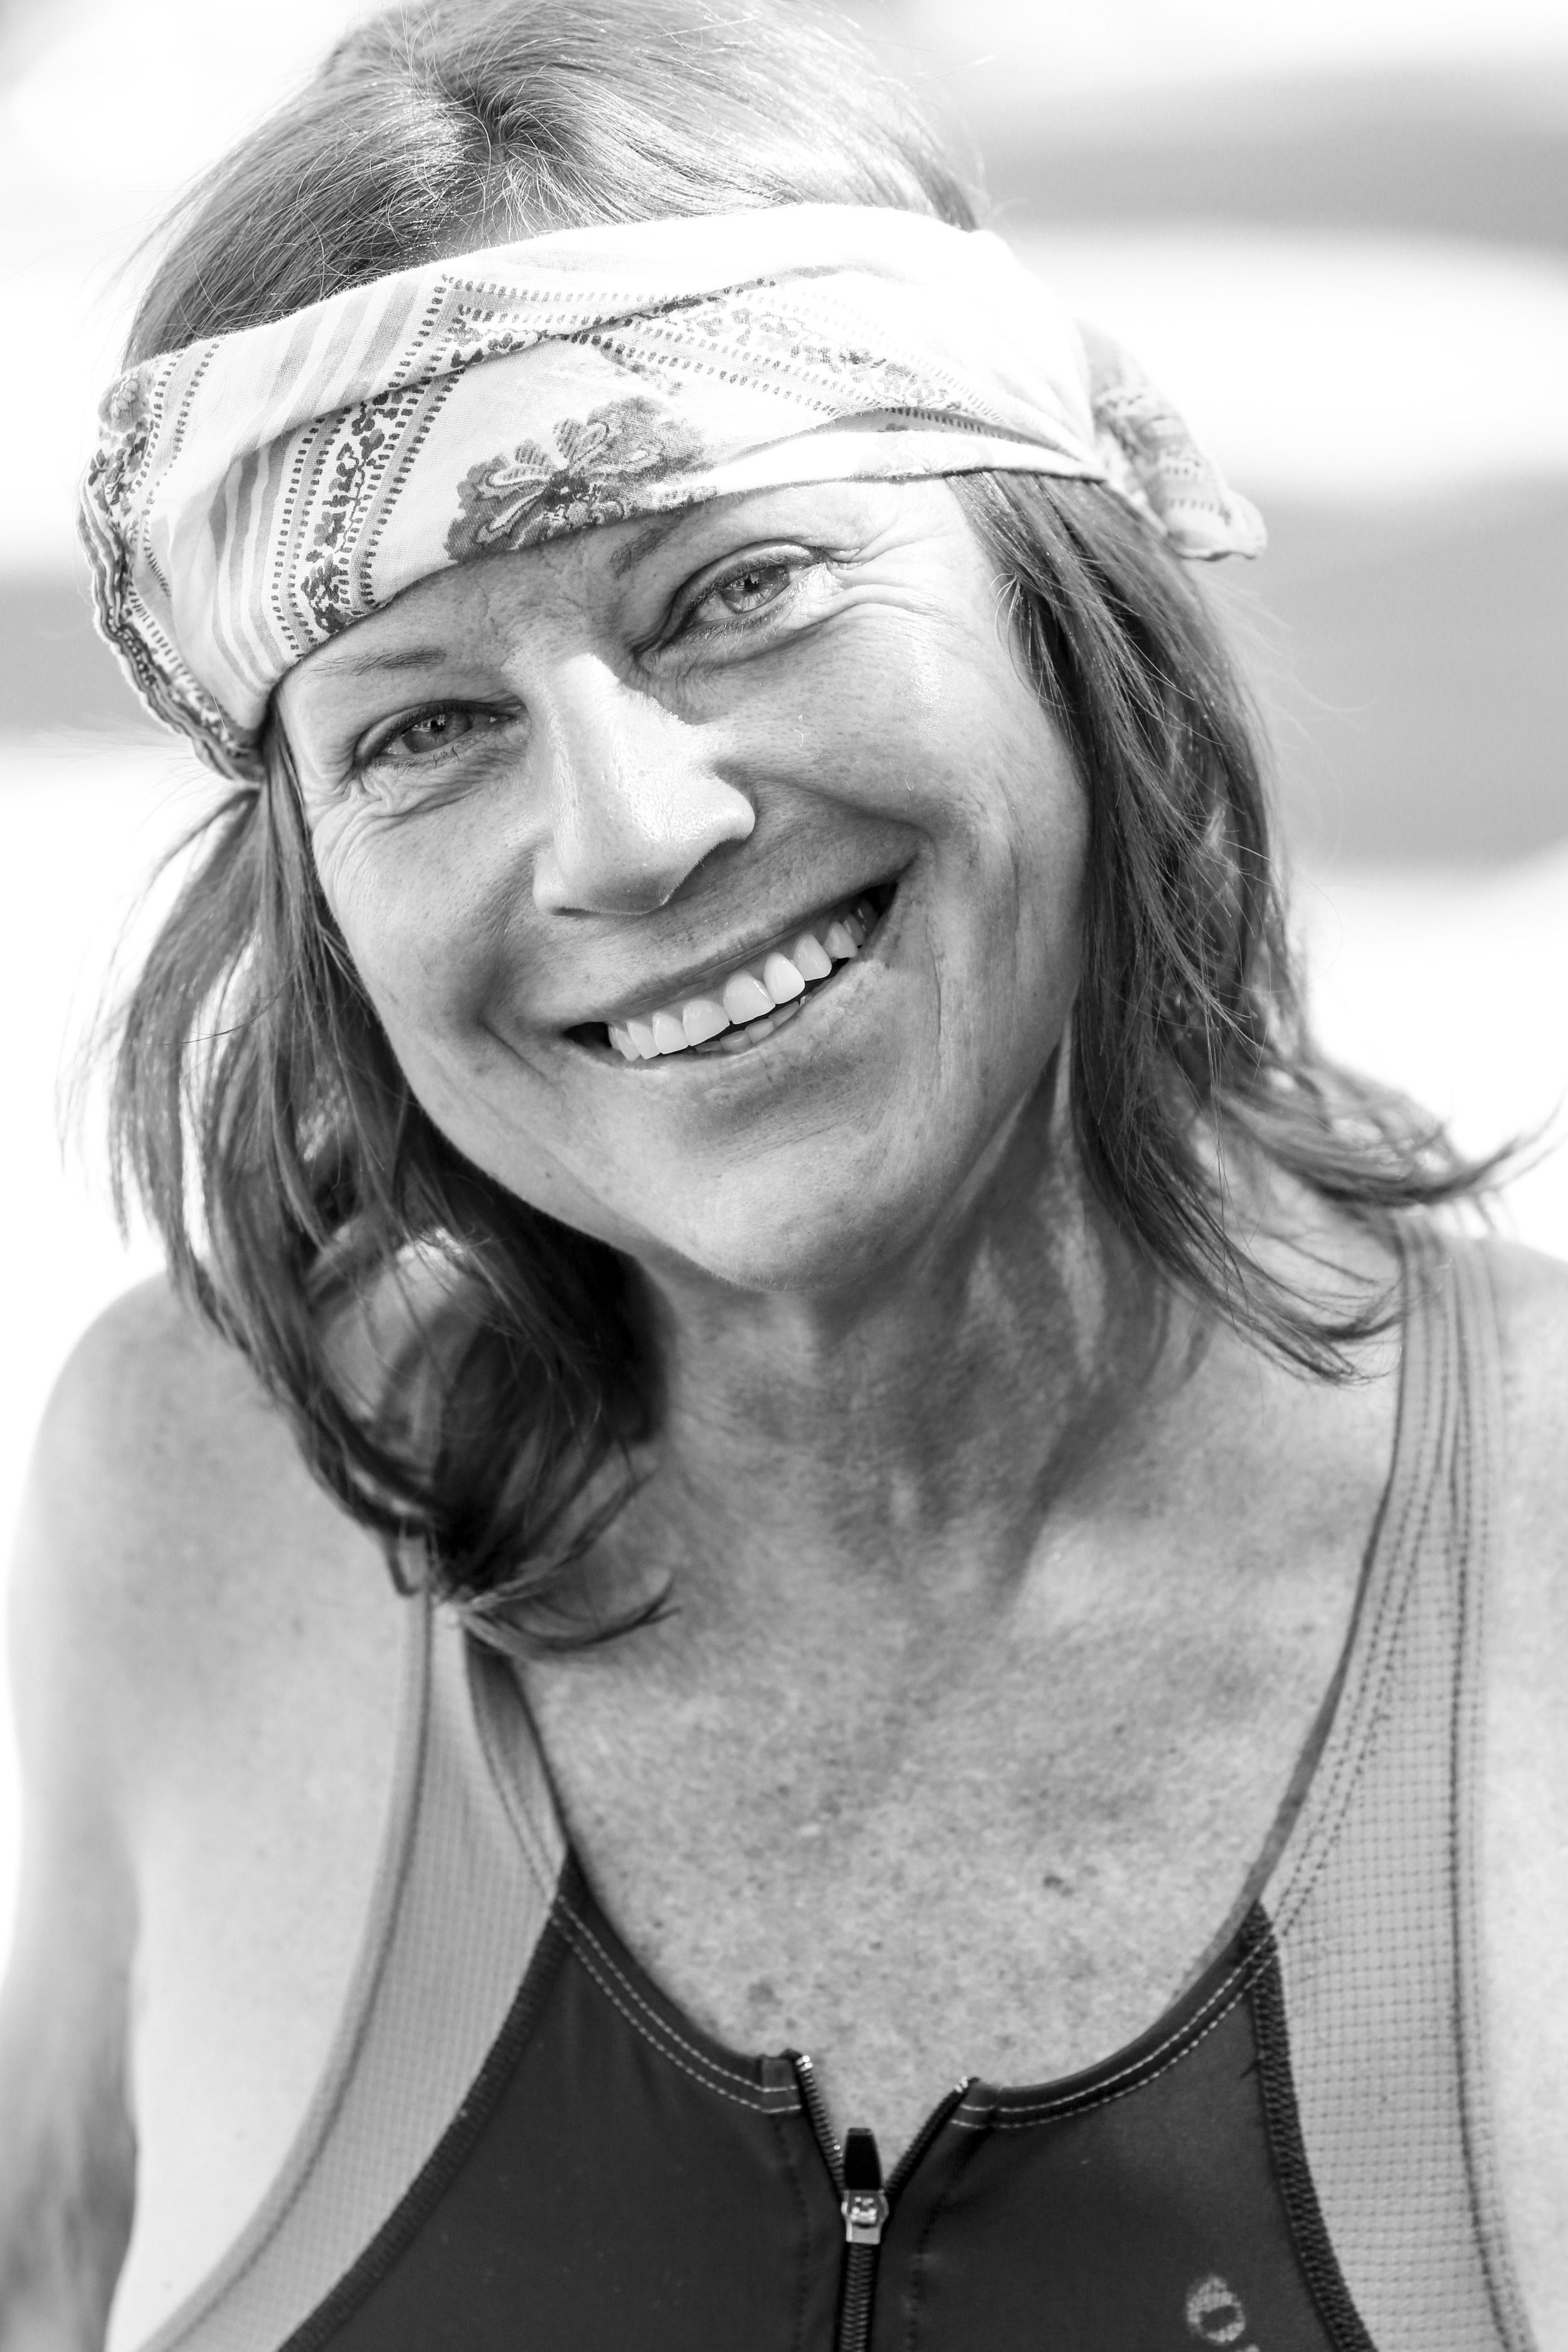 Lisa Sicotte, of Enfield